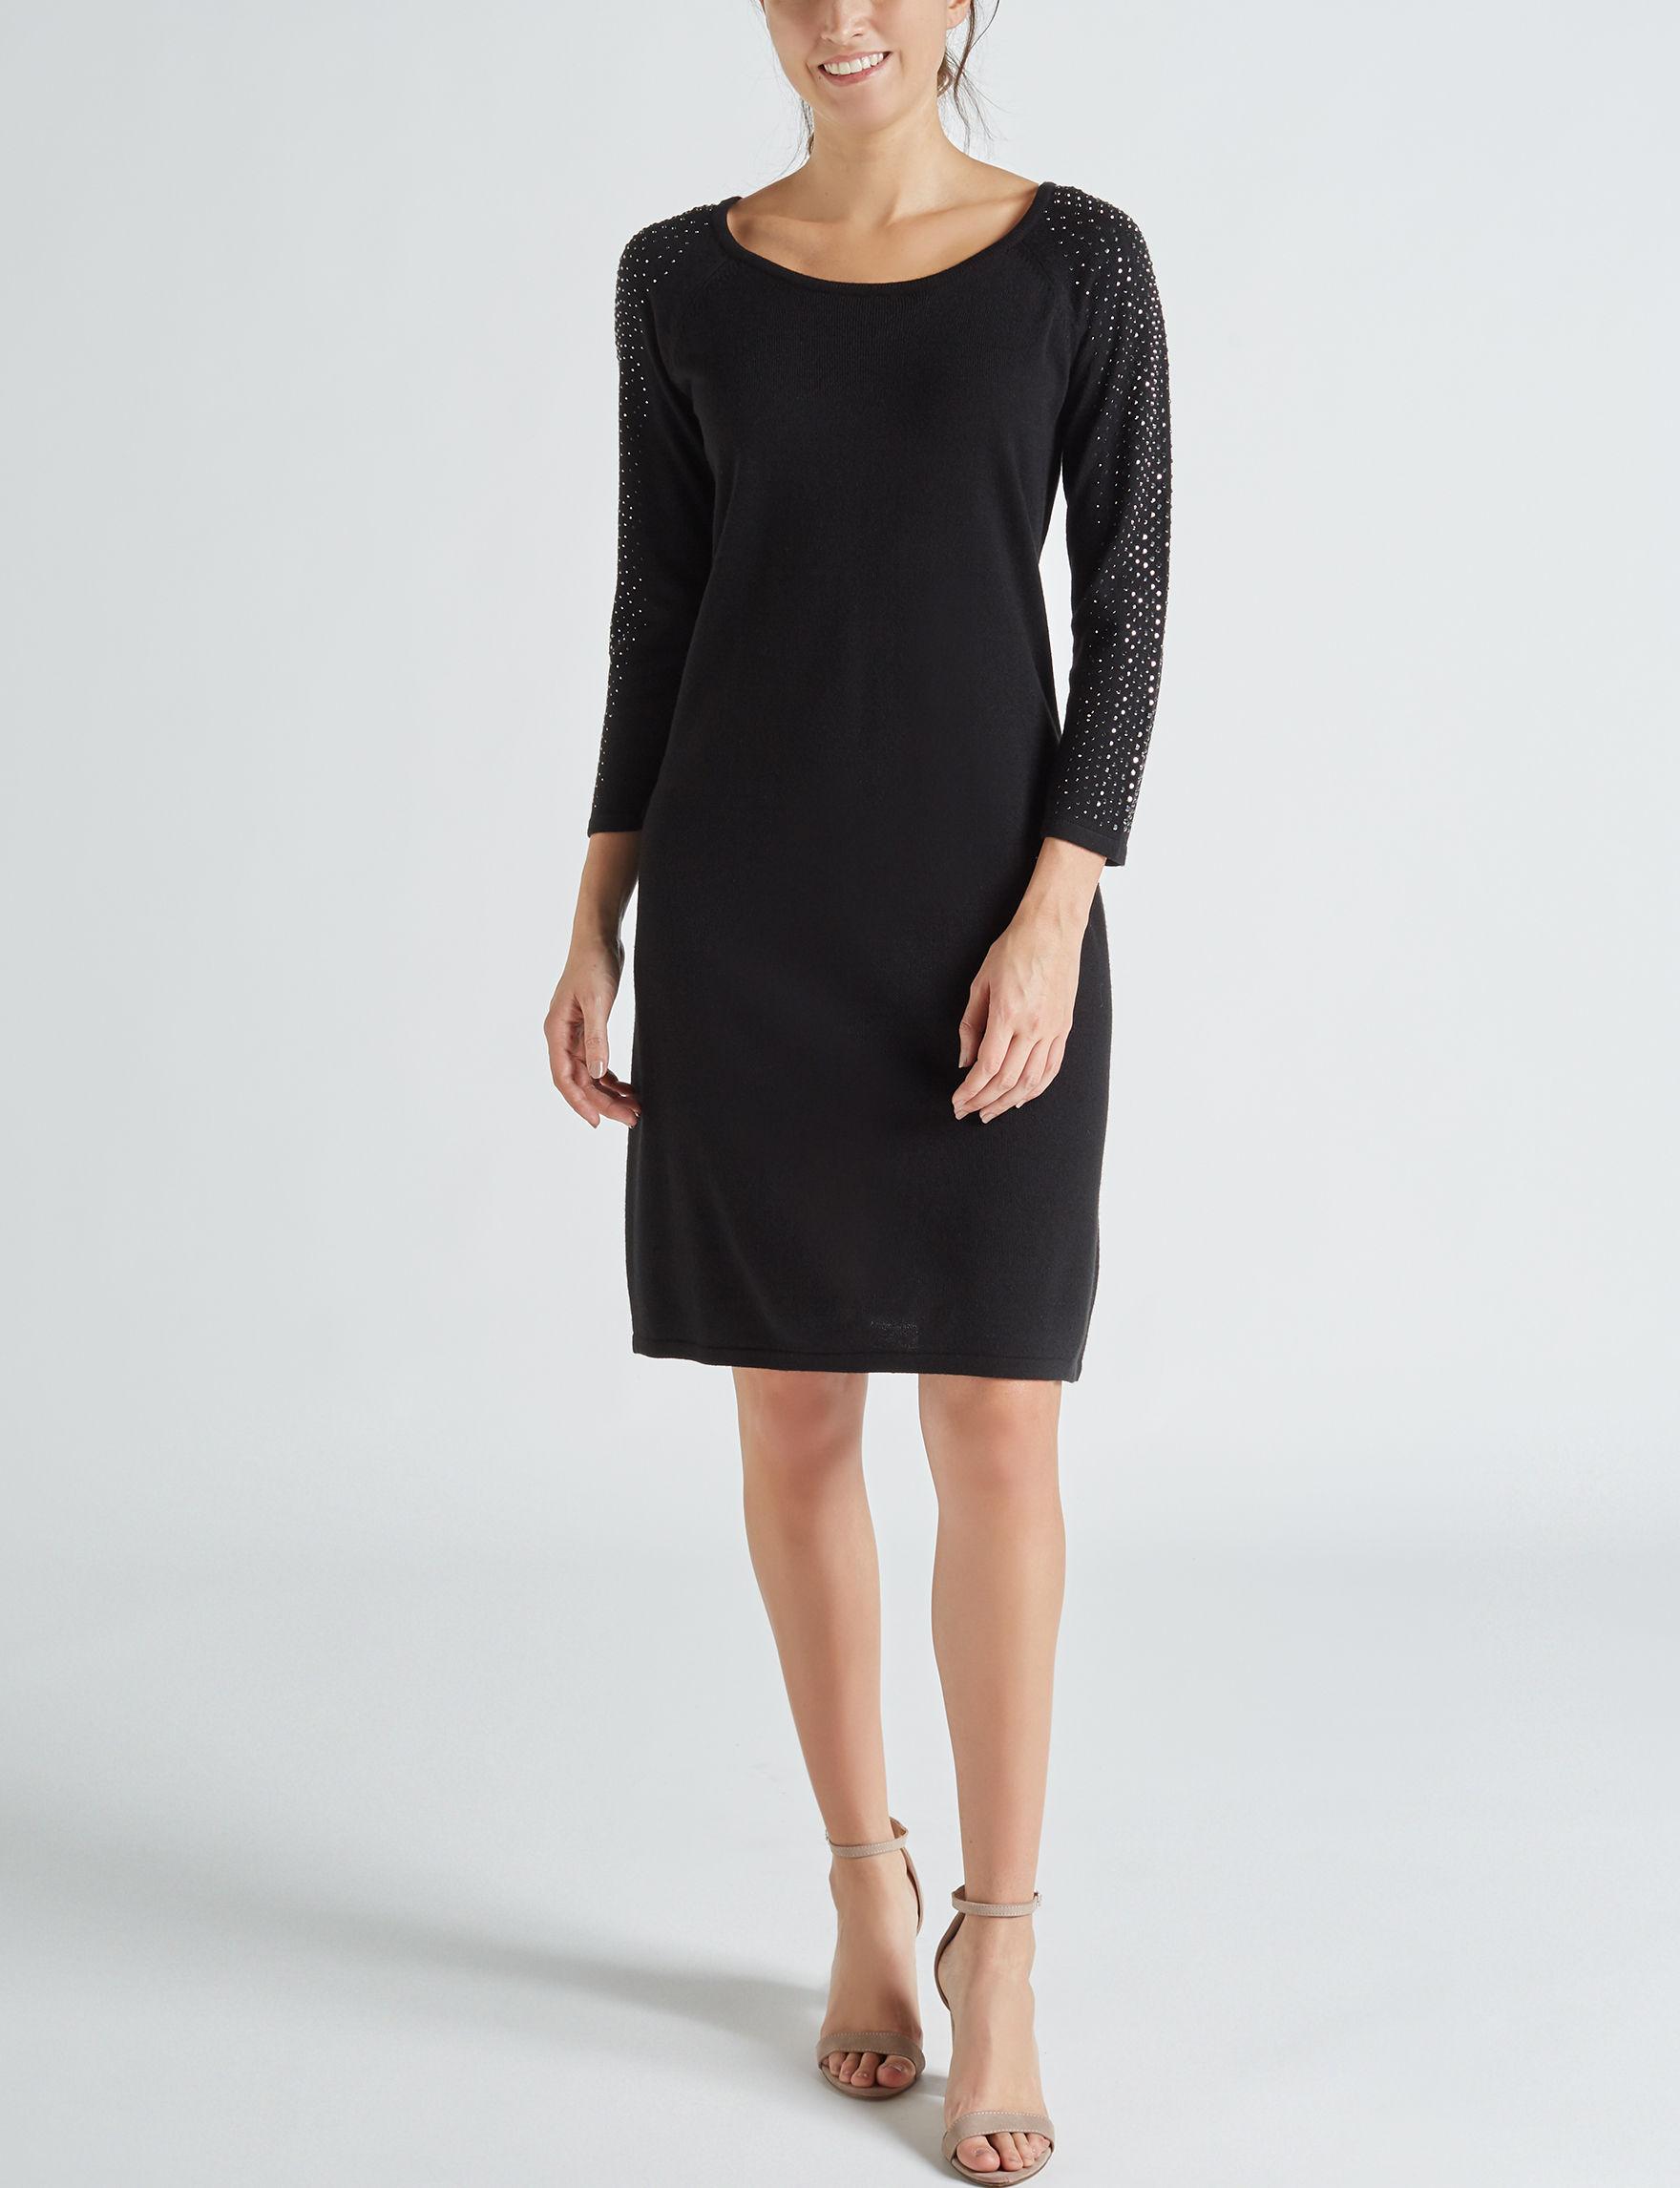 Studio One Black Everyday & Casual Sweater Dresses